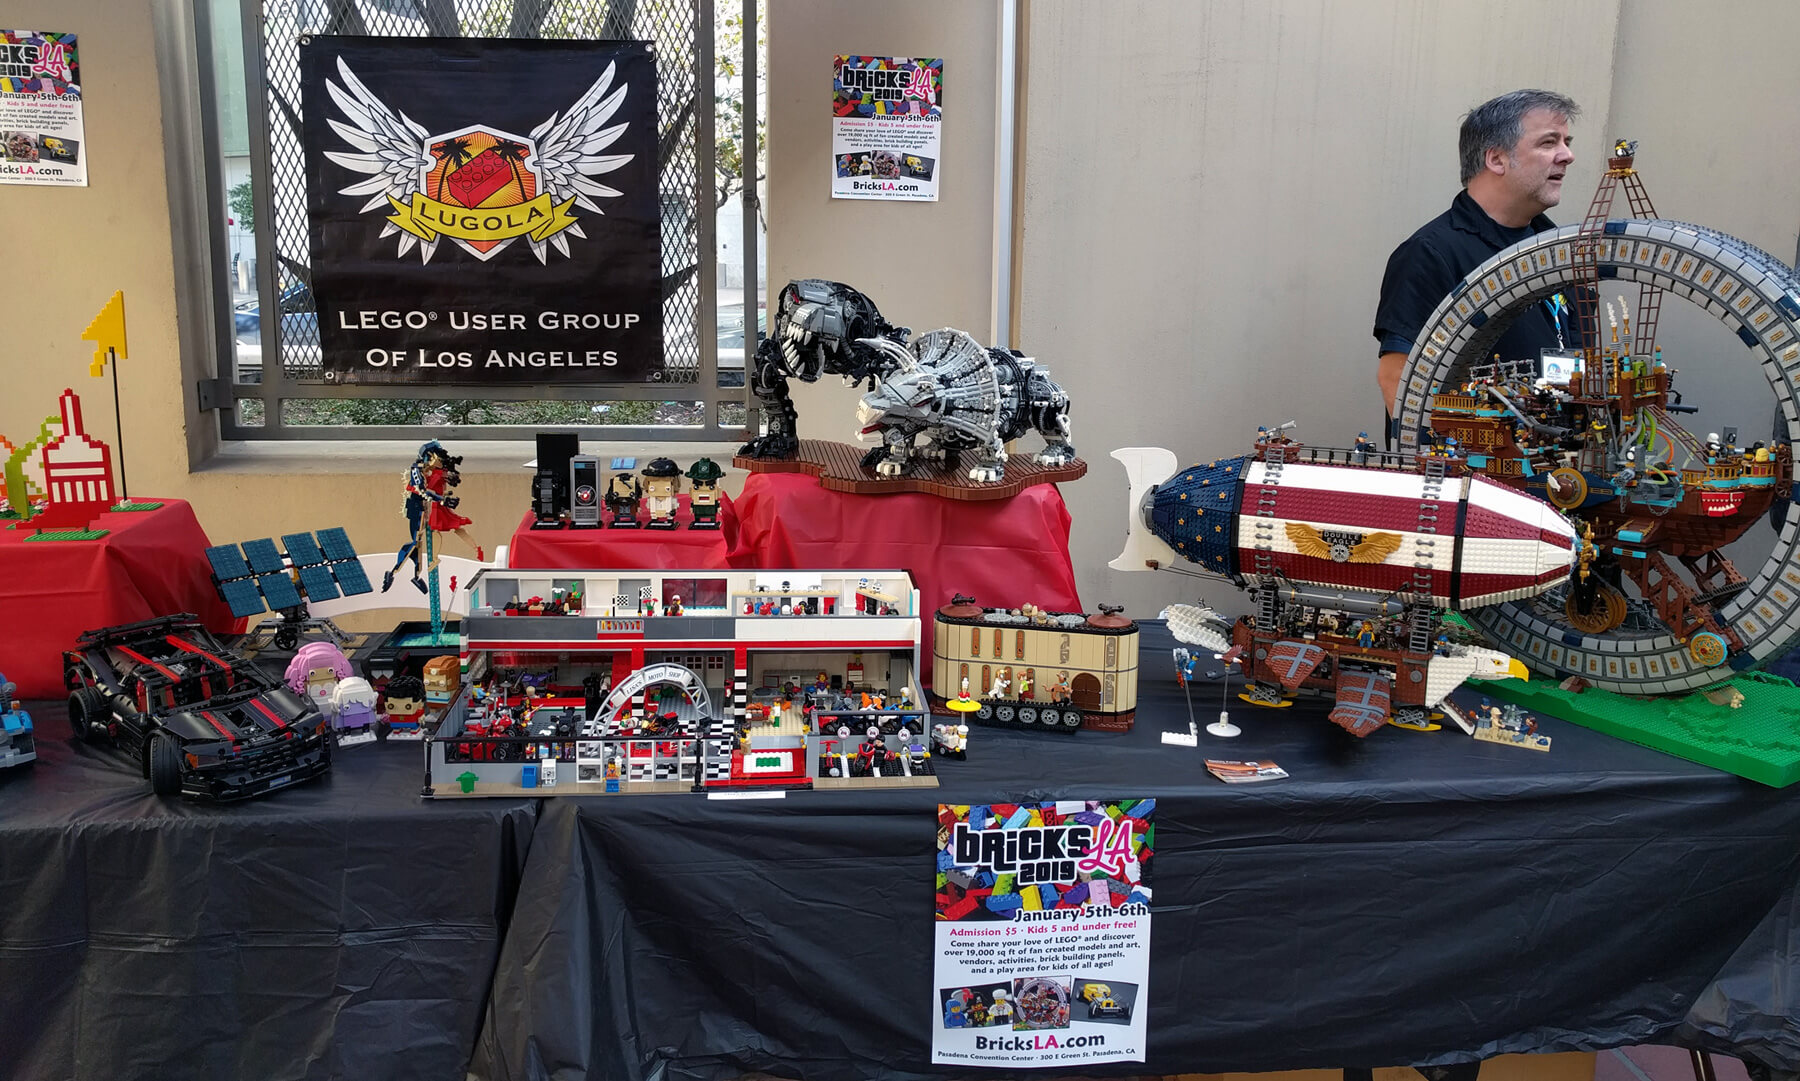 LUGOLA at DTLA Maker Faire